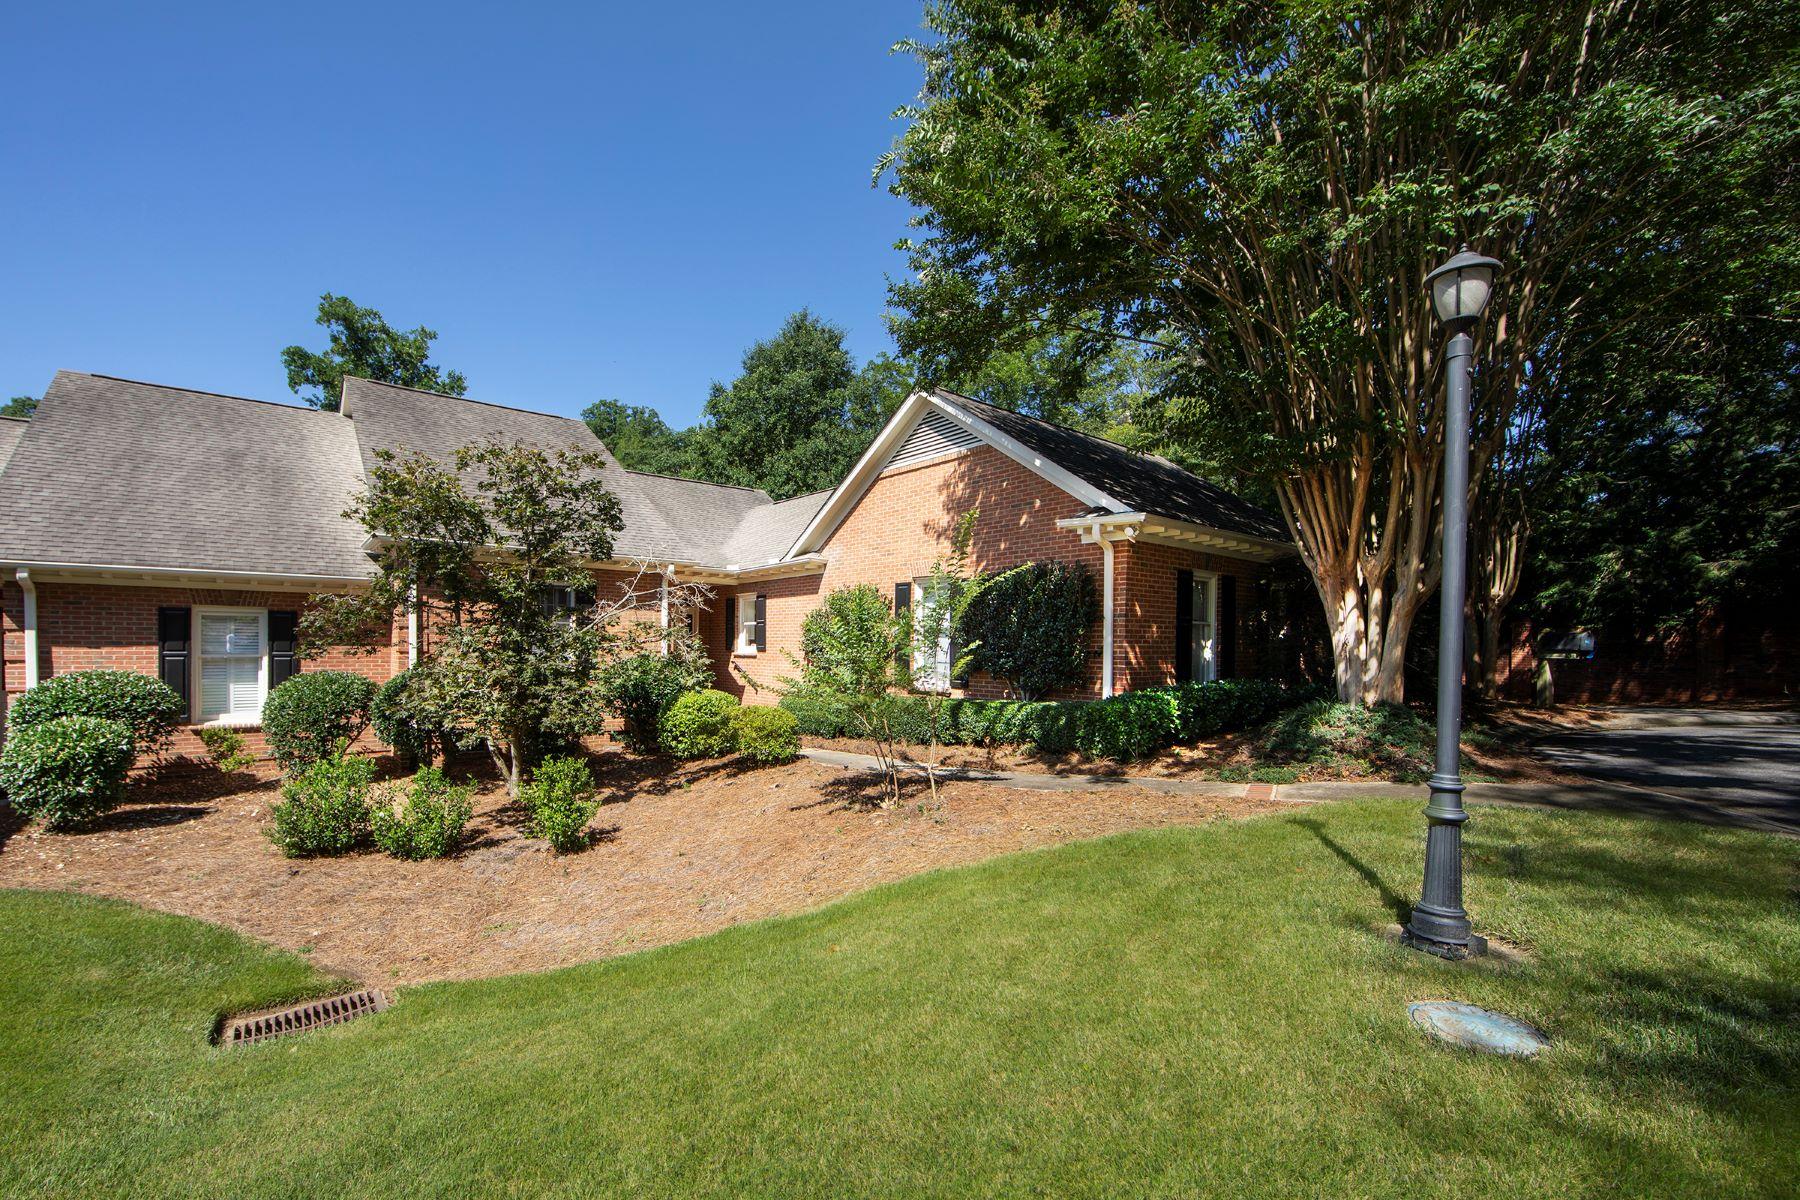 Condominiums للـ Sale في Updated Condo in Alta Vista Area 15 Landsdown Avenue, Greenville, South Carolina 29601 United States